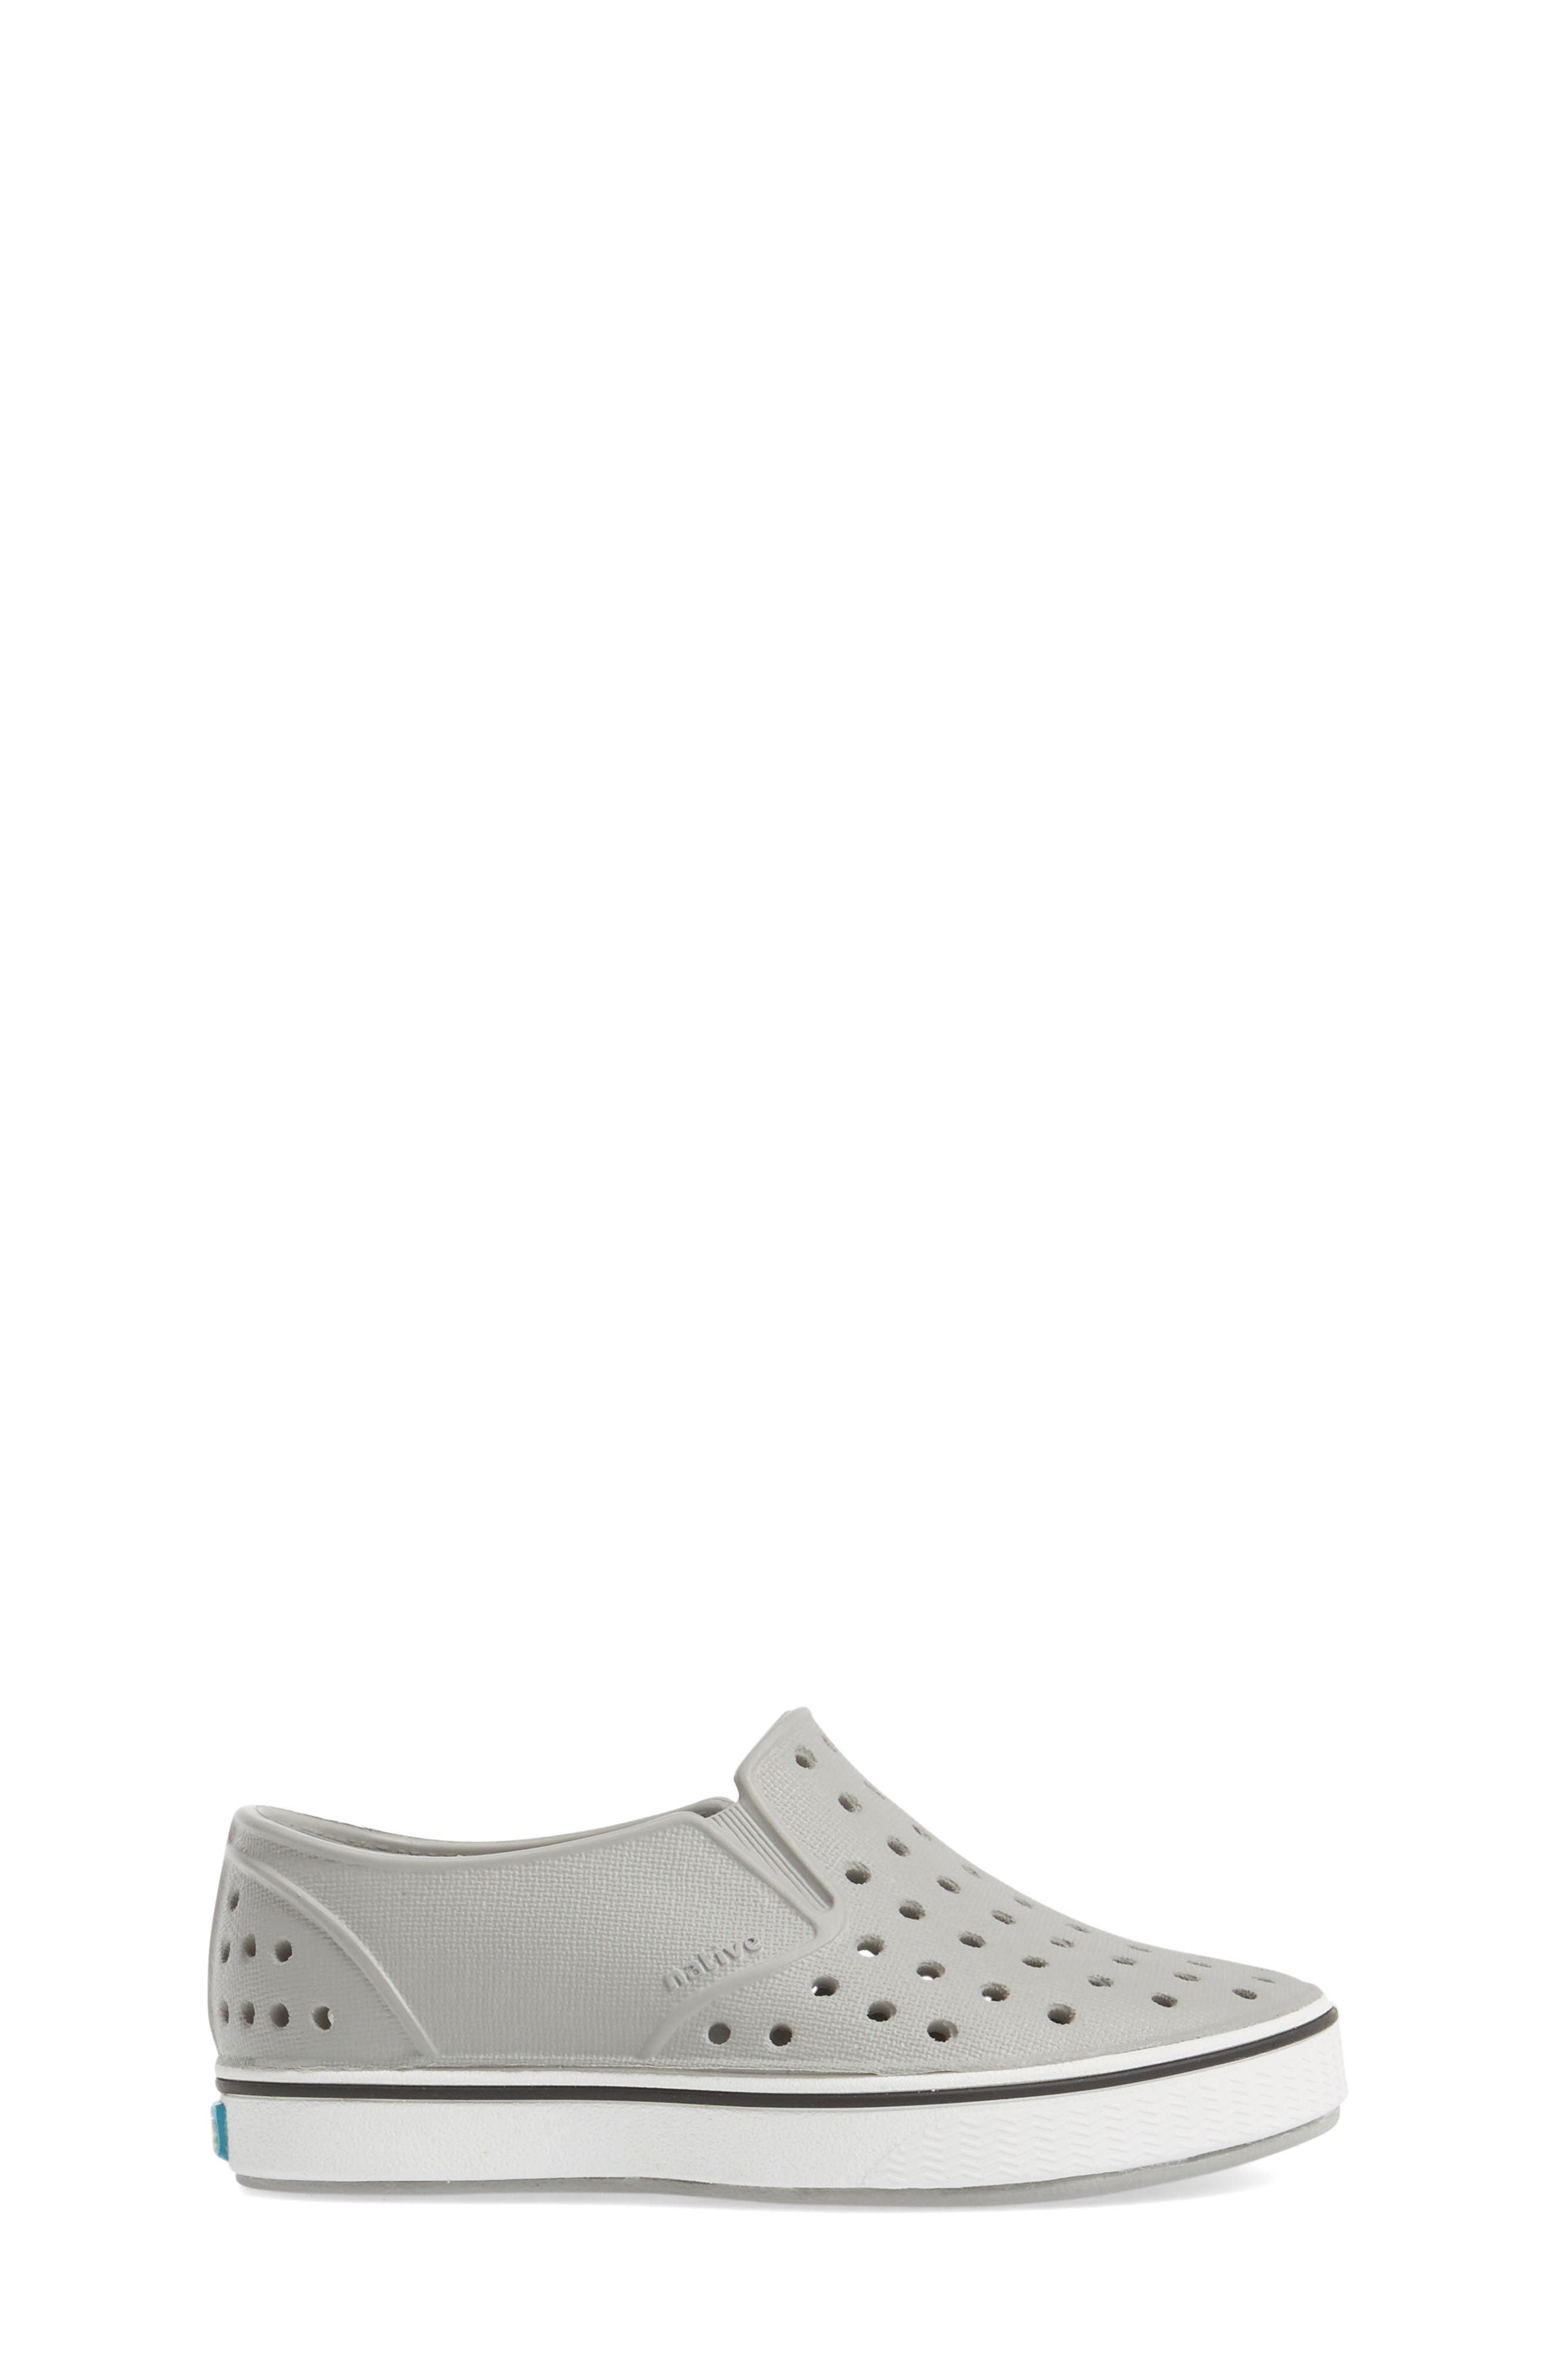 Miles Water Friendly Slip-On Sneaker,                             Alternate thumbnail 3, color,                             Pigeon Grey/ Shell White